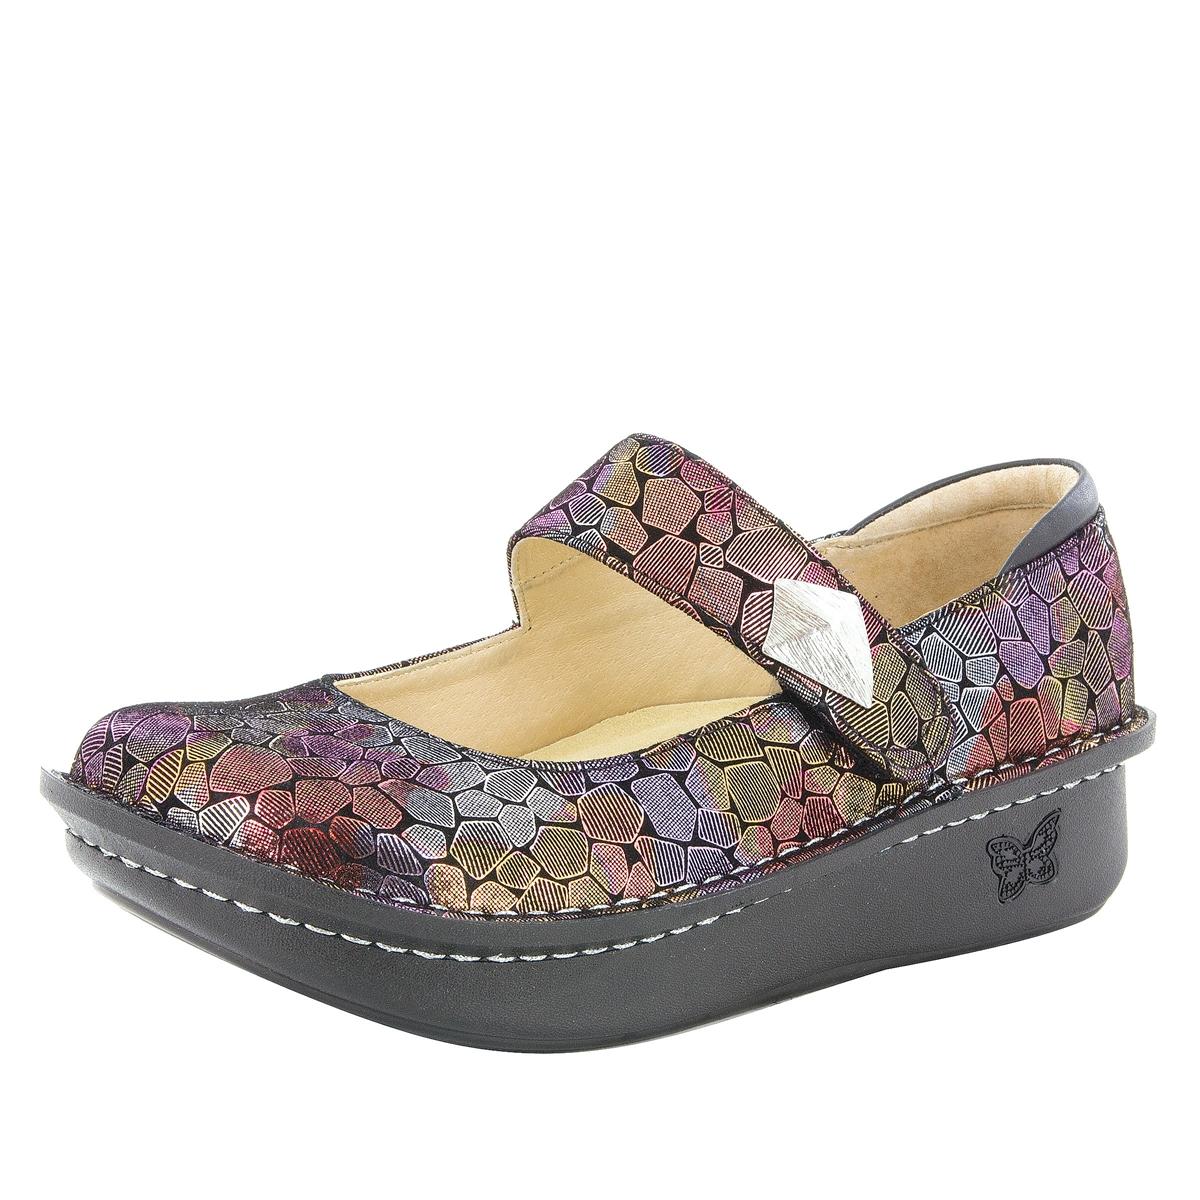 Alegria Women S Seville Shoe